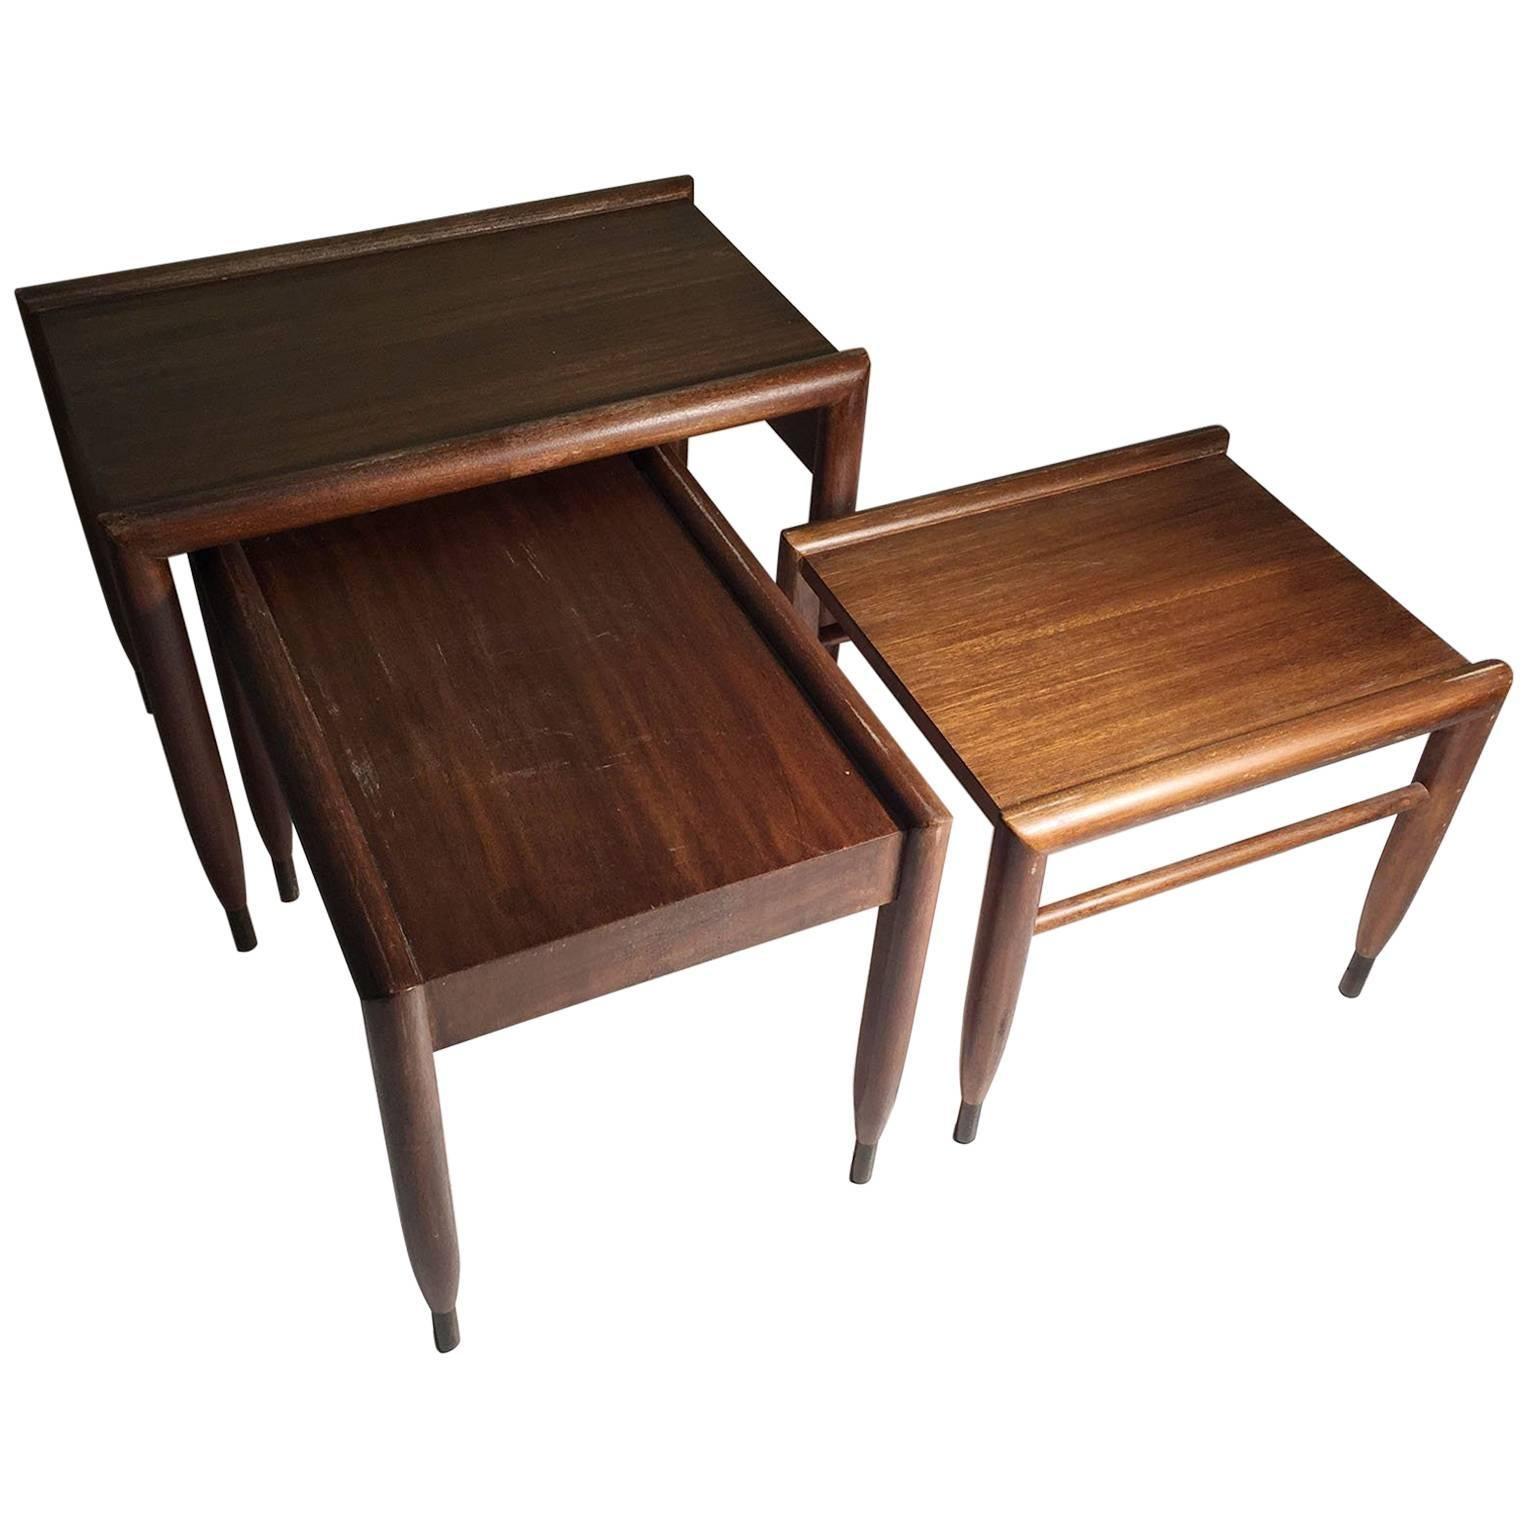 John Keal Nesting Tables for Brown Saltman